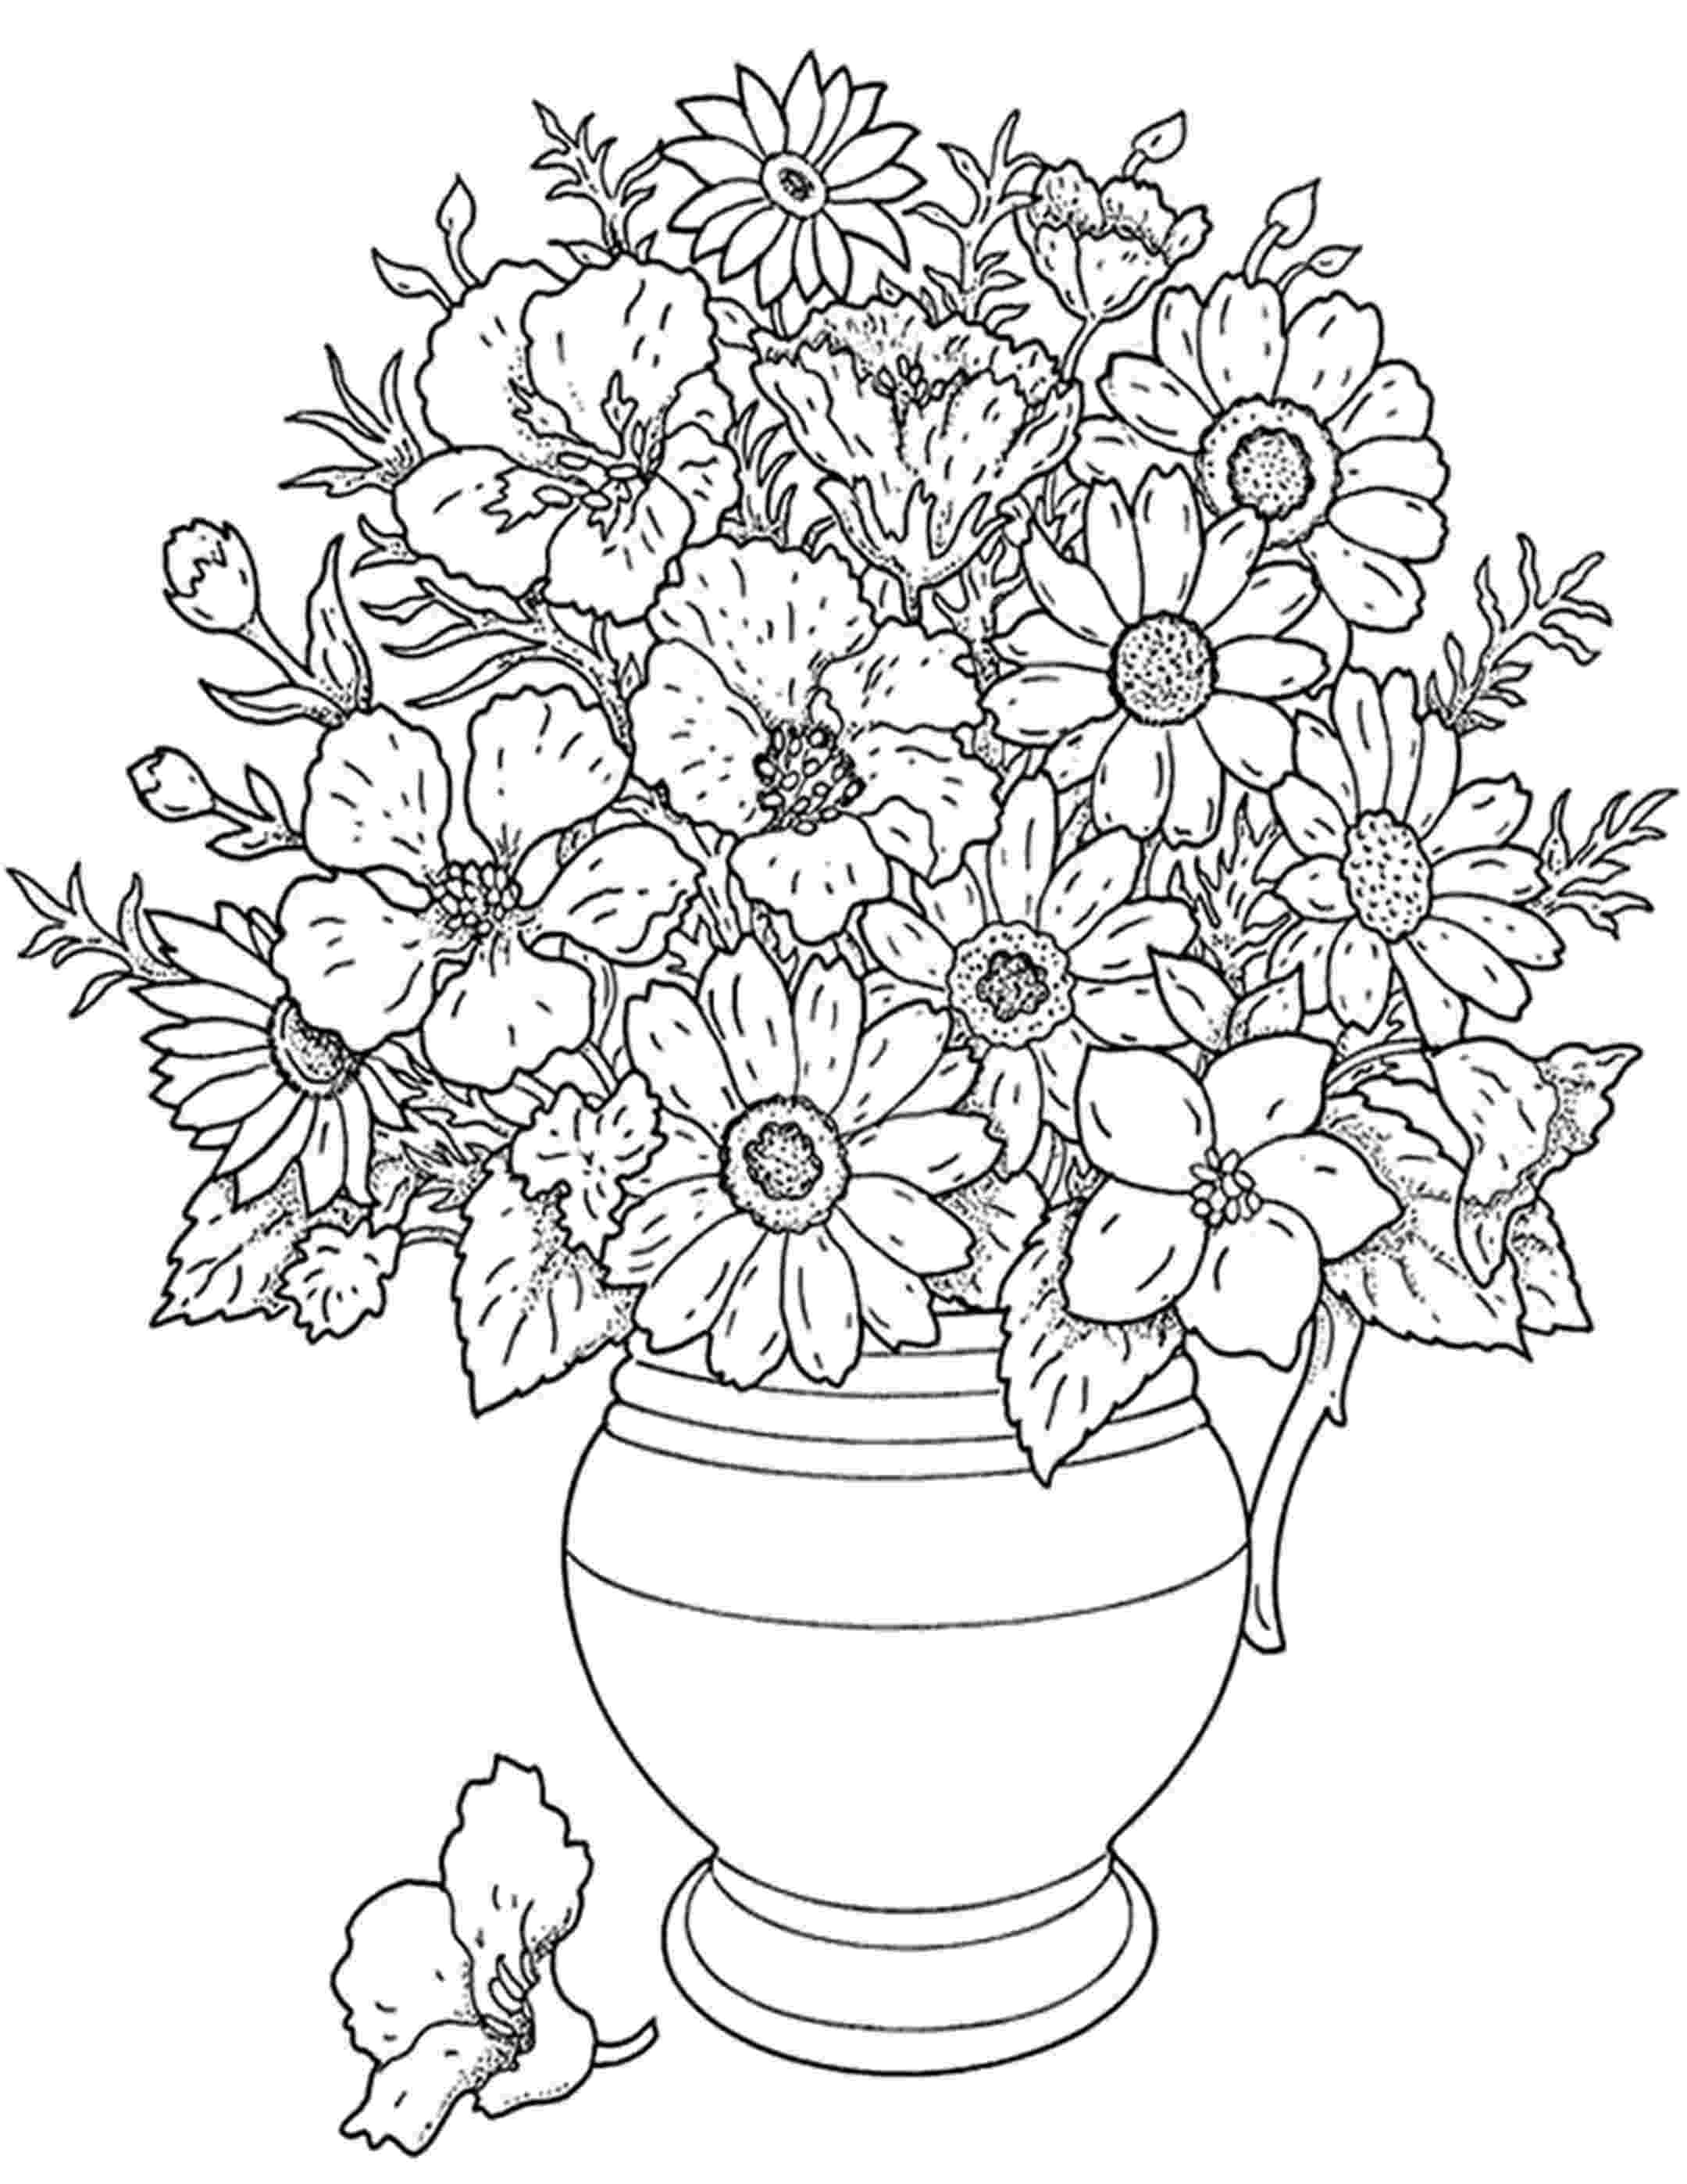 printable coloring pages plants free printable flower coloring pages for kids best coloring pages printable plants 1 1